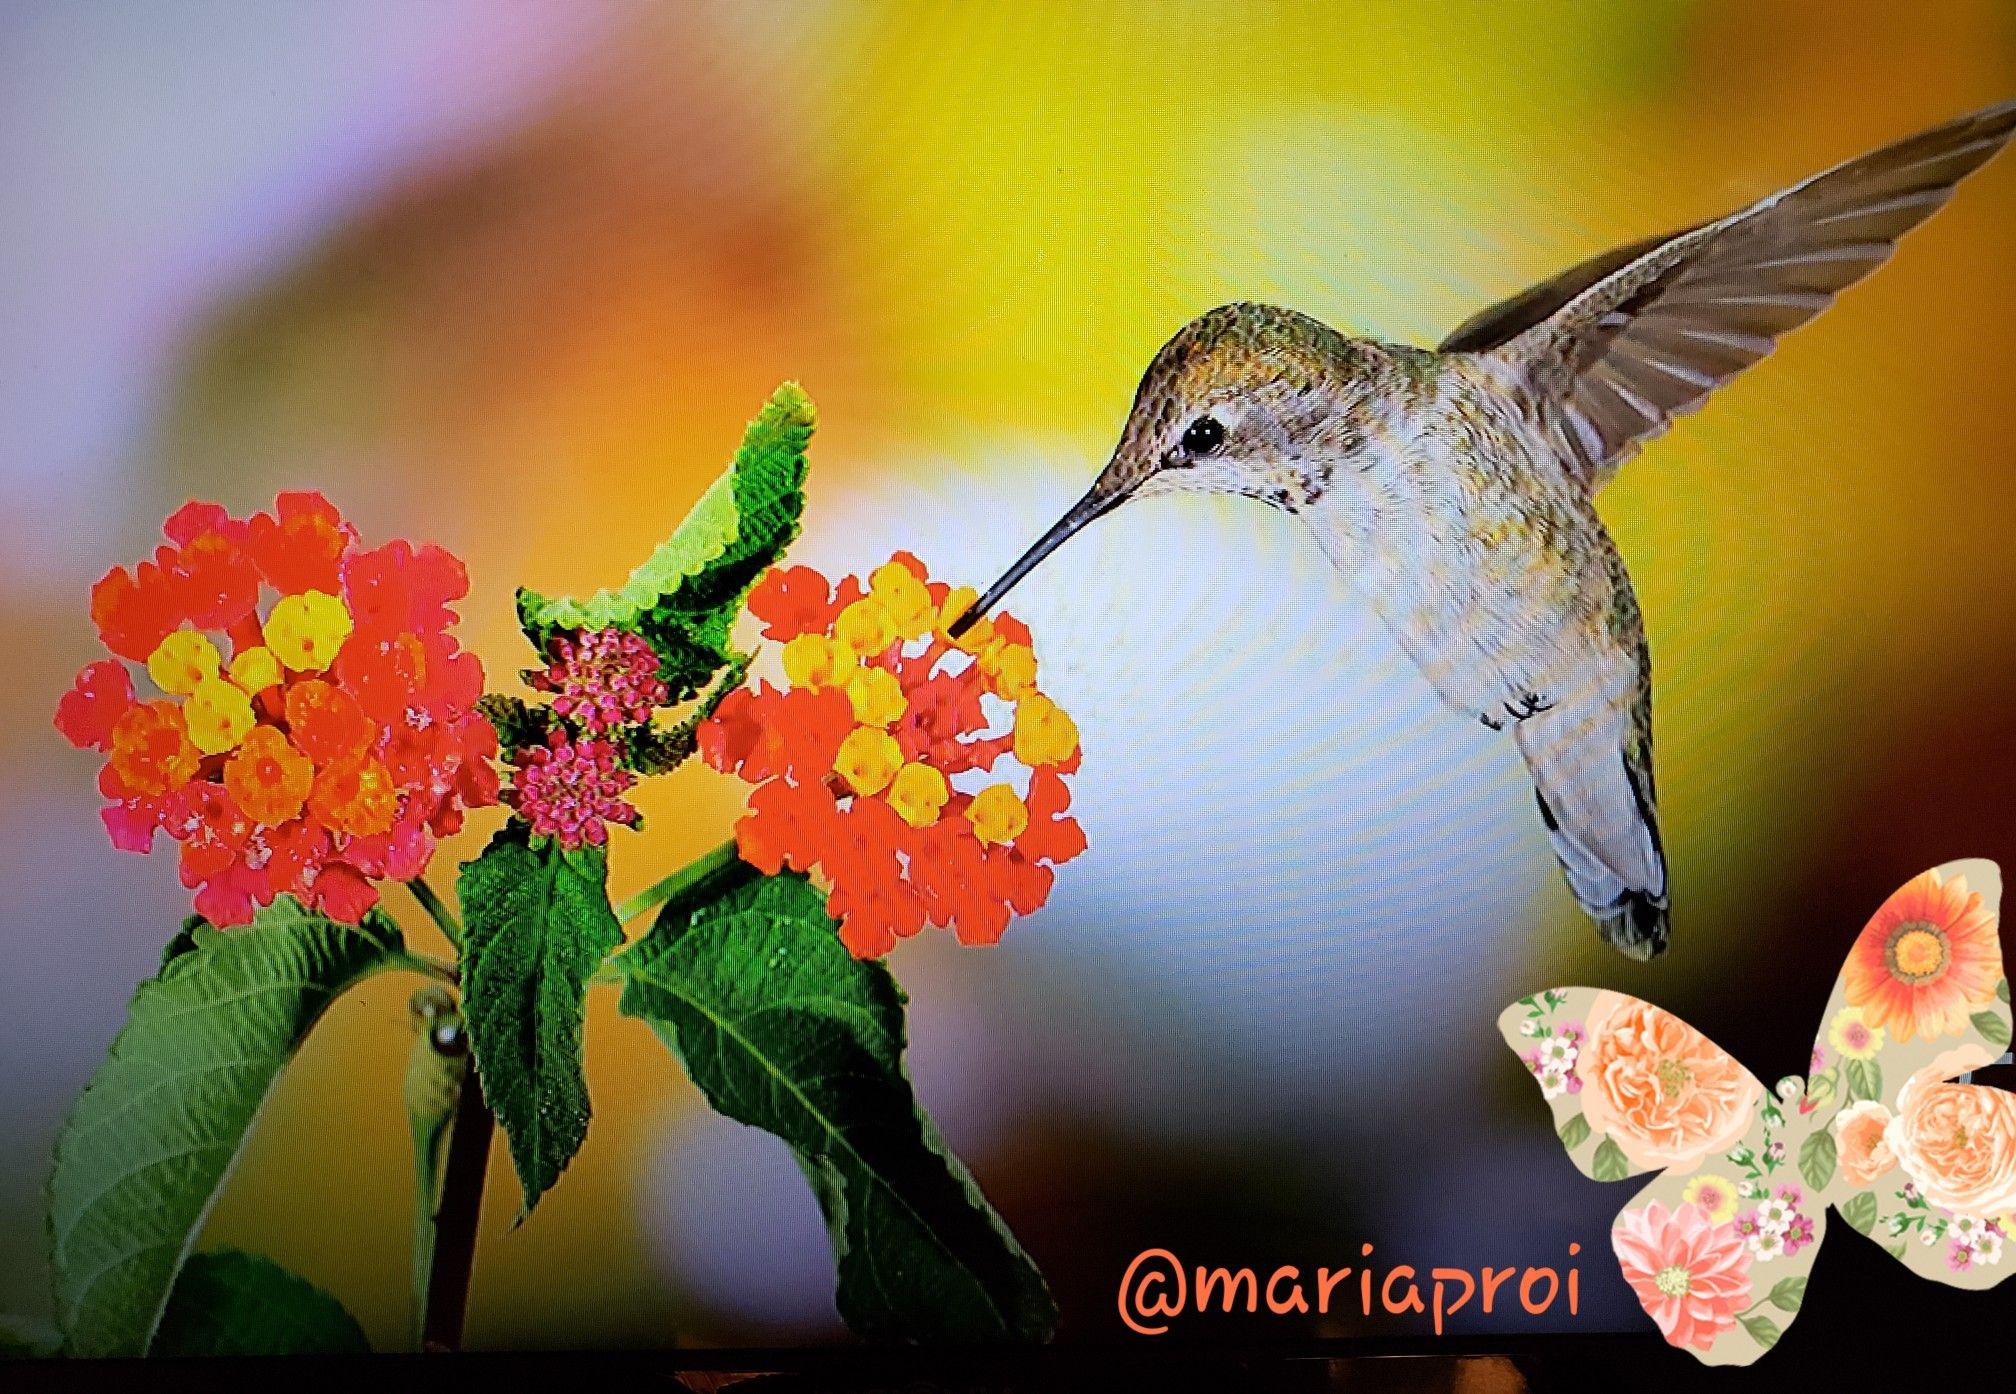 Beautiful hummingbird w/ flowers Chromecast background